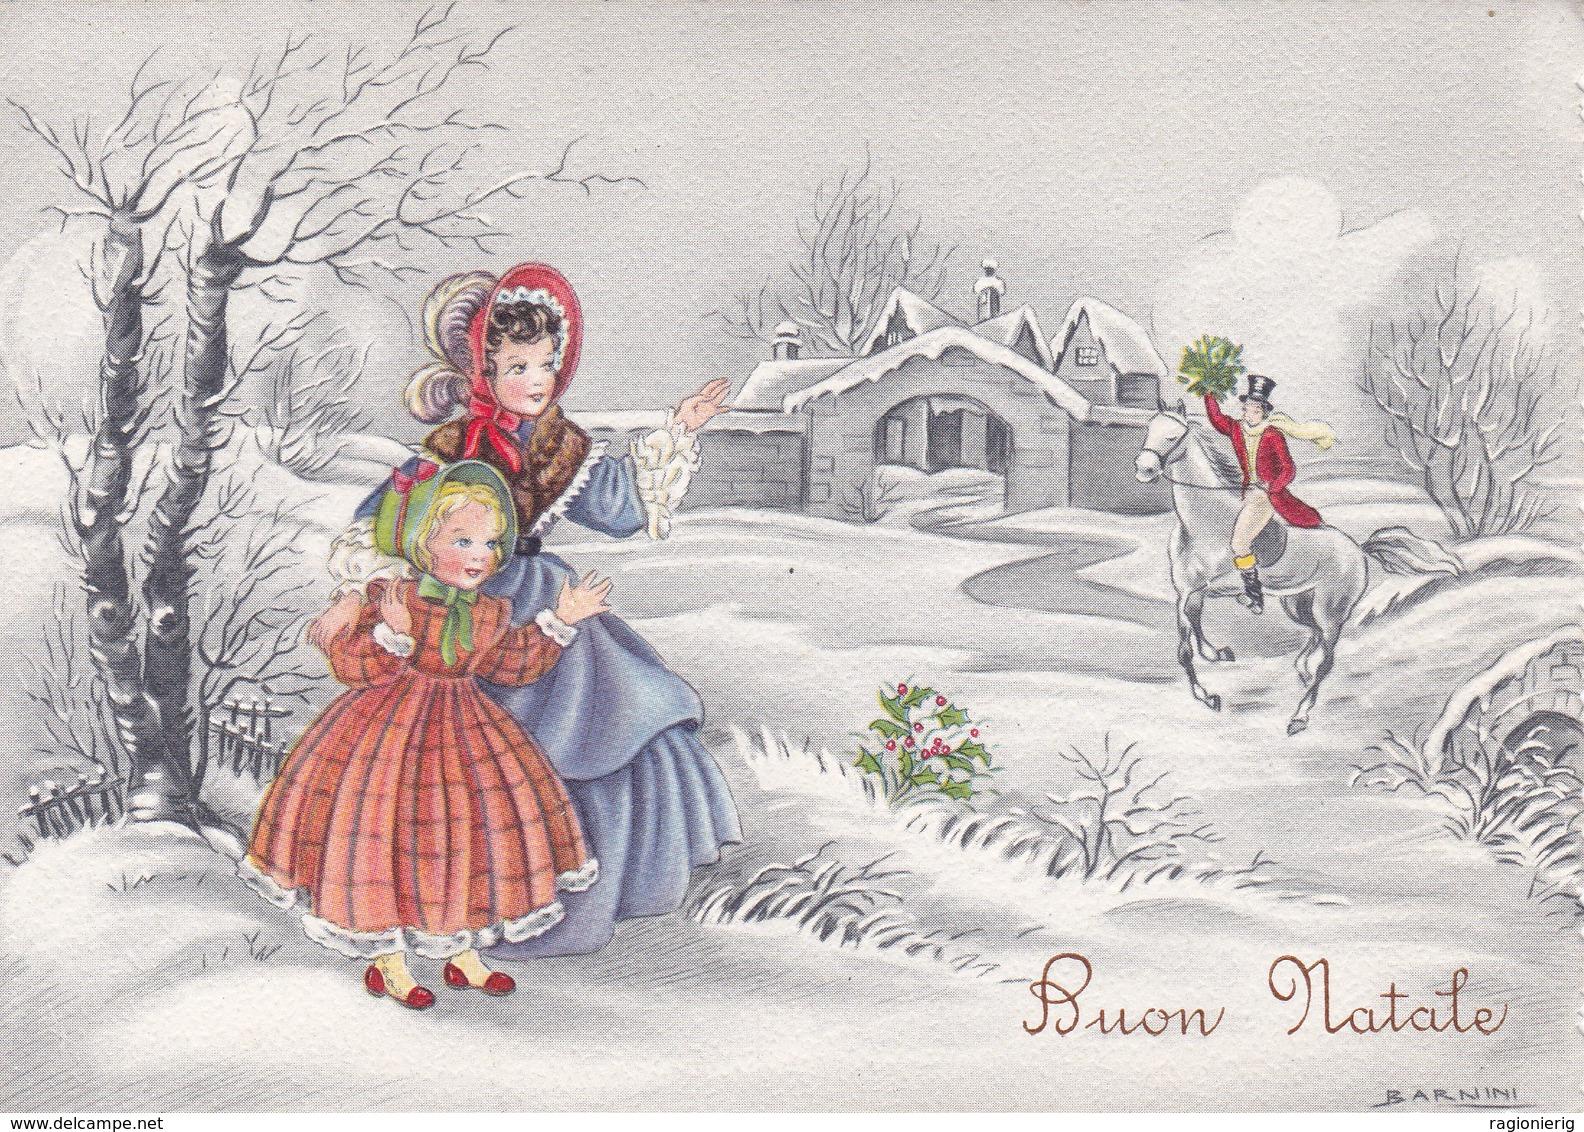 AUGURI FESTE - Buon Natale - Merry Christmas - Feliz Navidad - Joyeux Noël - Allegoria - Barnini - 1955 - Natale